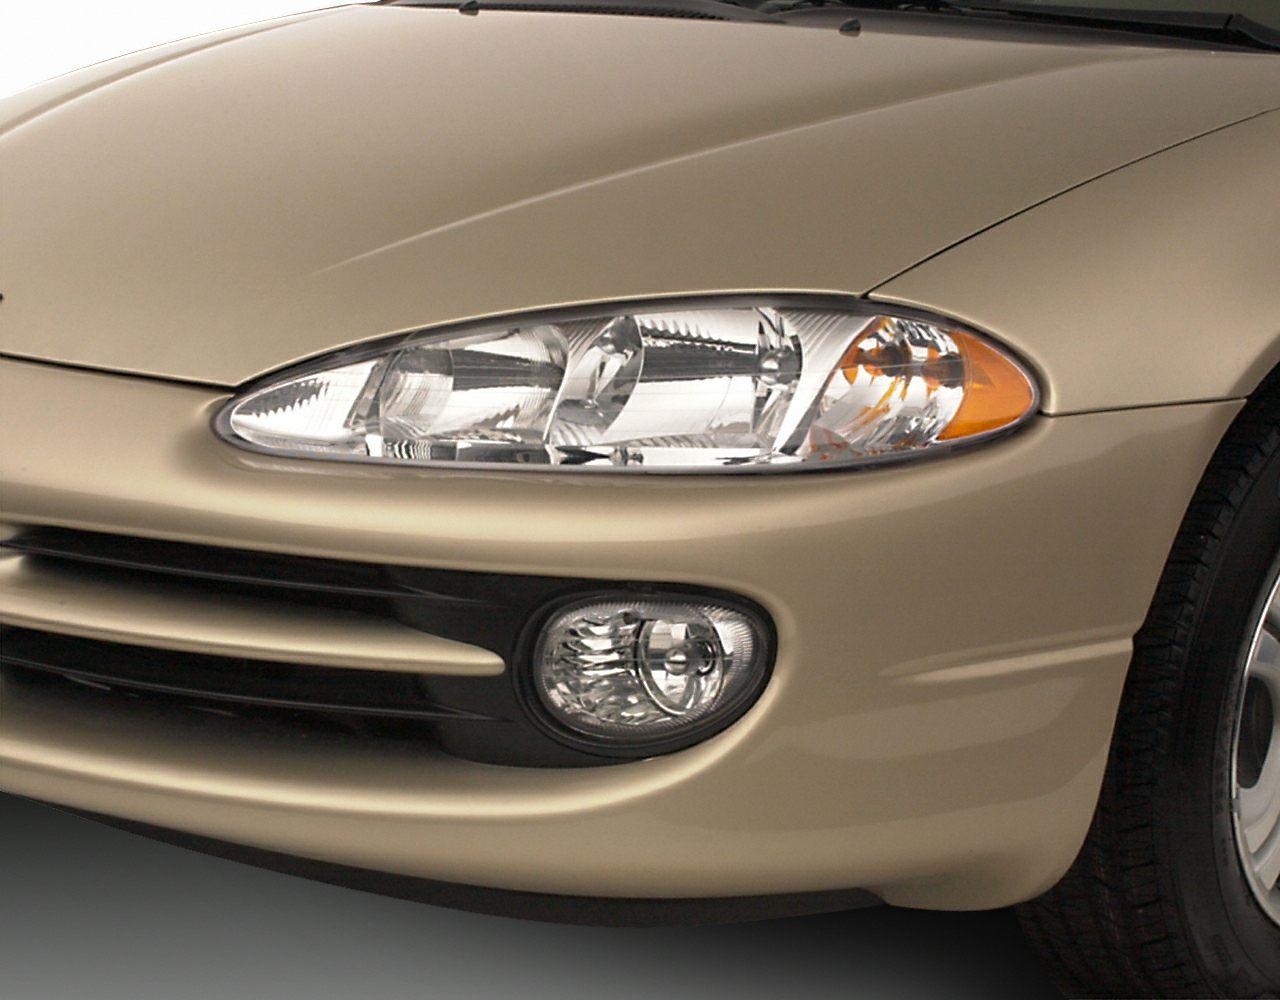 2000 Dodge Intrepid Exterior Photo